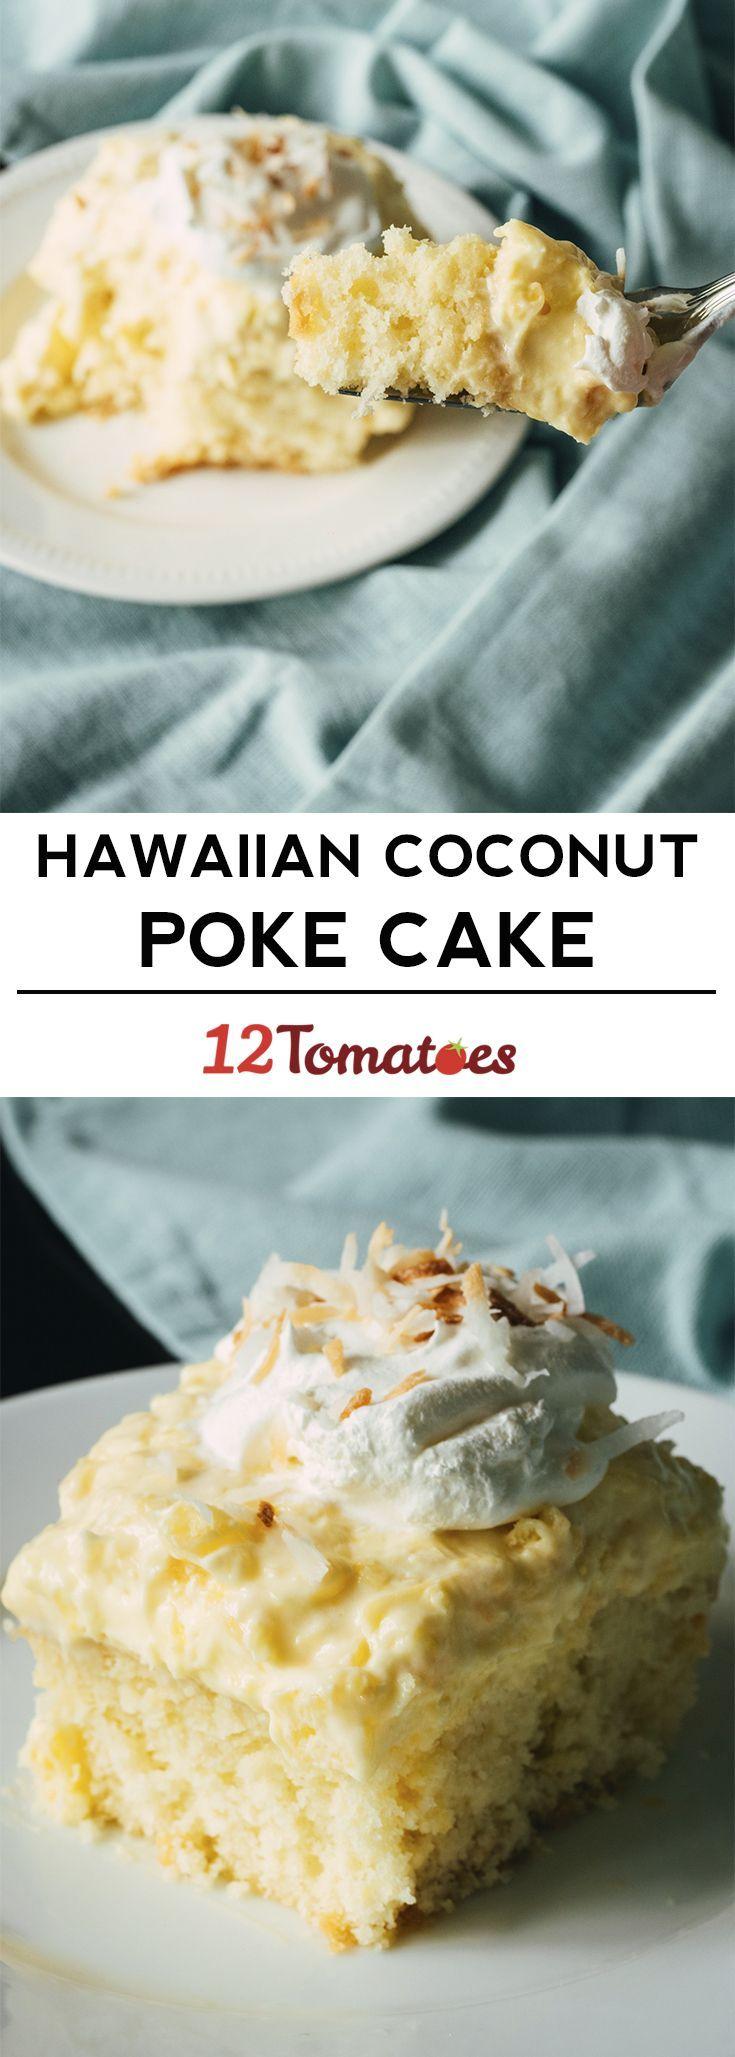 Hawaiian Coconut Poke Cake